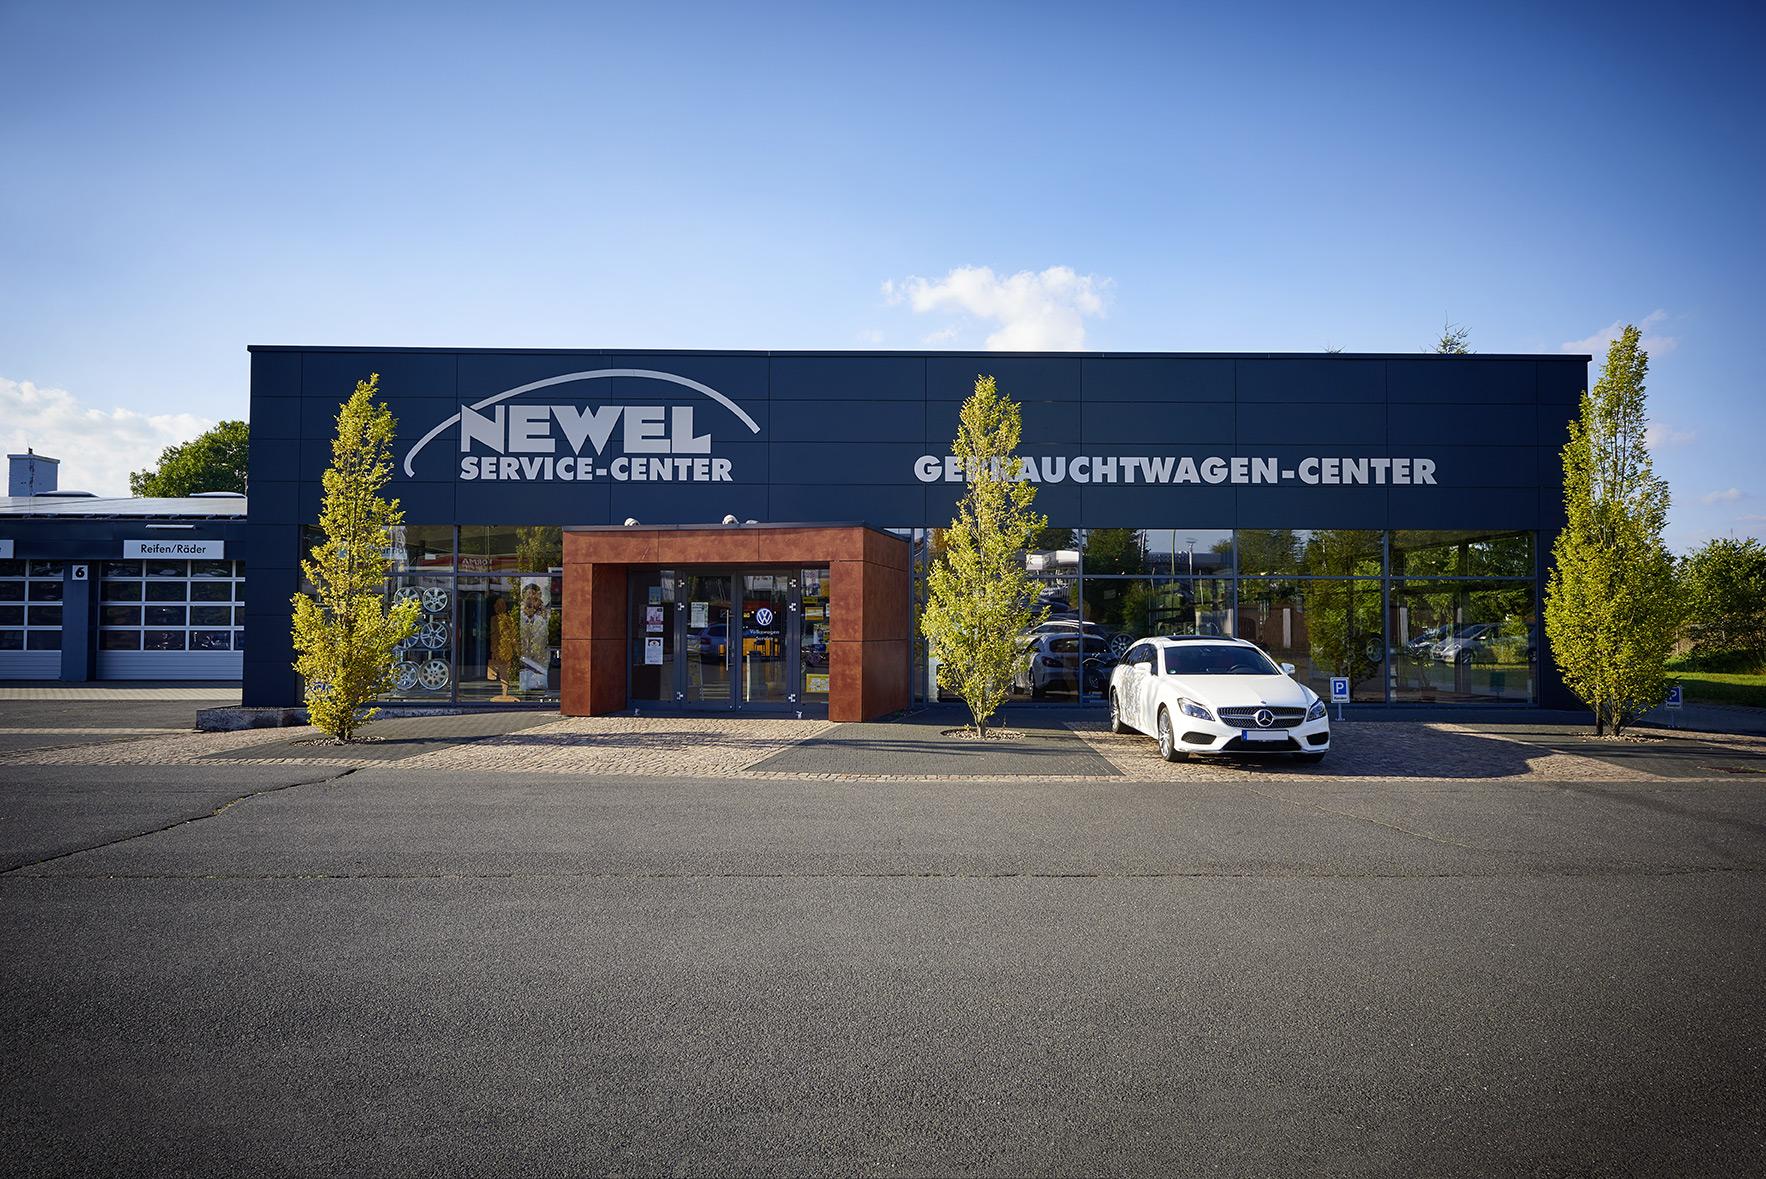 newel-ref-wi_solar_07_09_16_kaisersesch_blankenrath__dsc4536_final